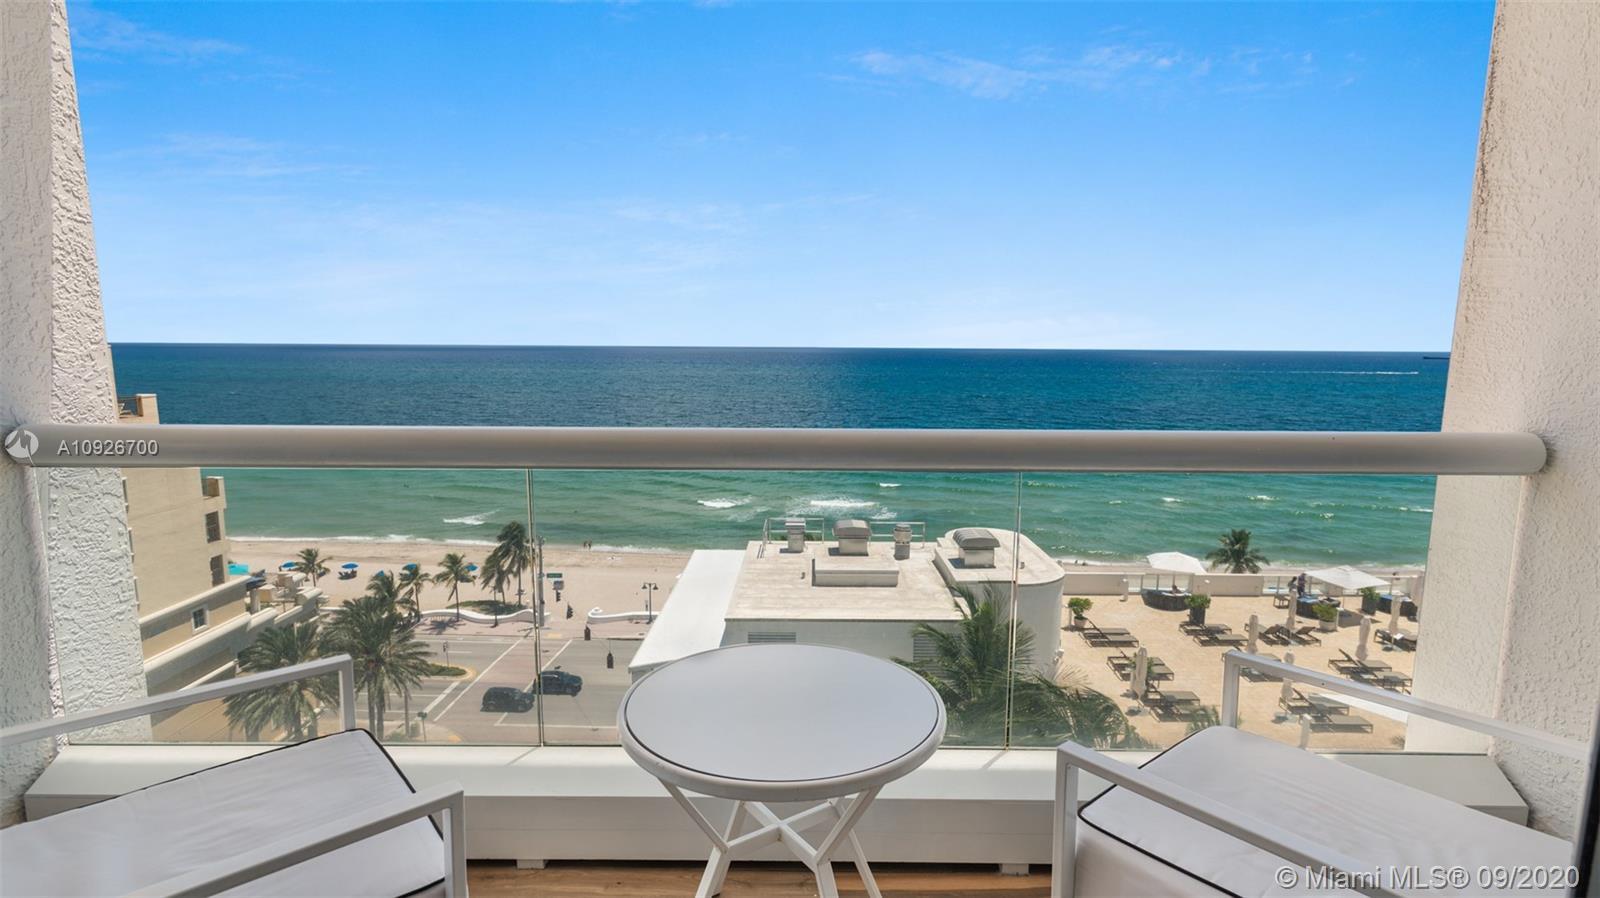 Ocean Resort Residences #1017 - 551 N Fort Lauderdale Beach Blvd #1017, Fort Lauderdale, FL 33304